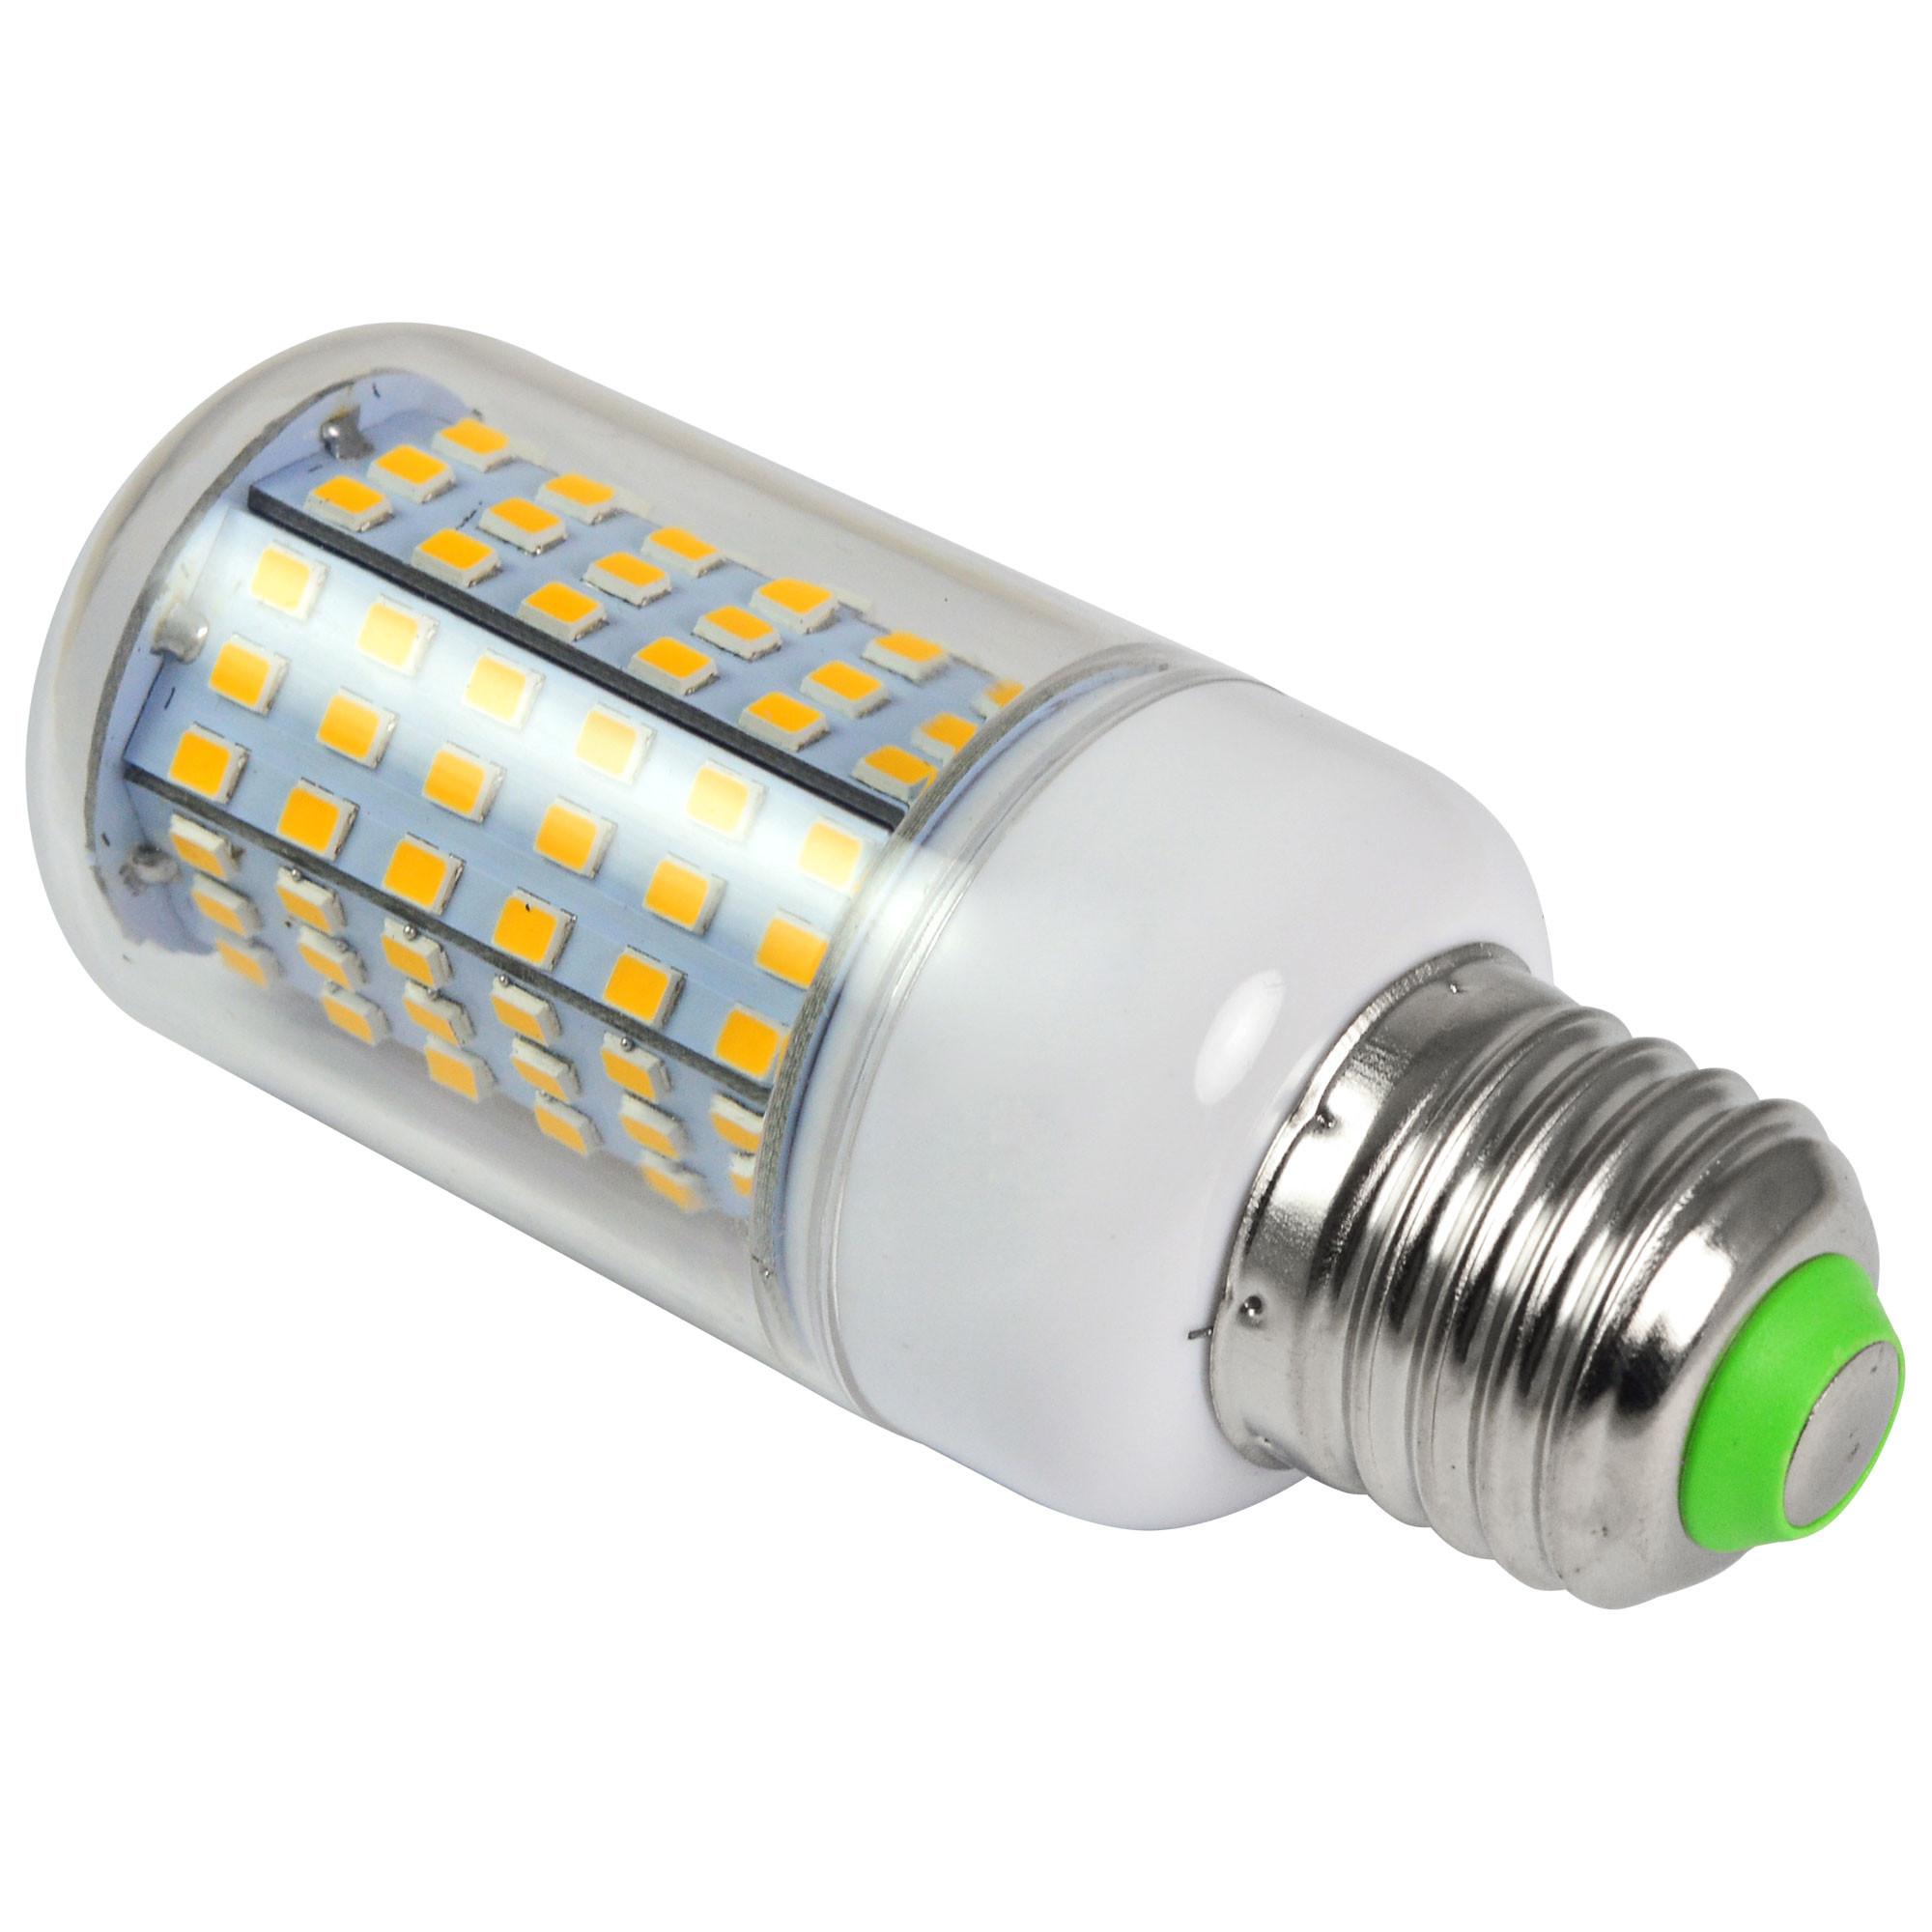 e27 12w led corn light 126x 2835 smd leds led bulb ac 220 240v in warm white energy saving lamp. Black Bedroom Furniture Sets. Home Design Ideas